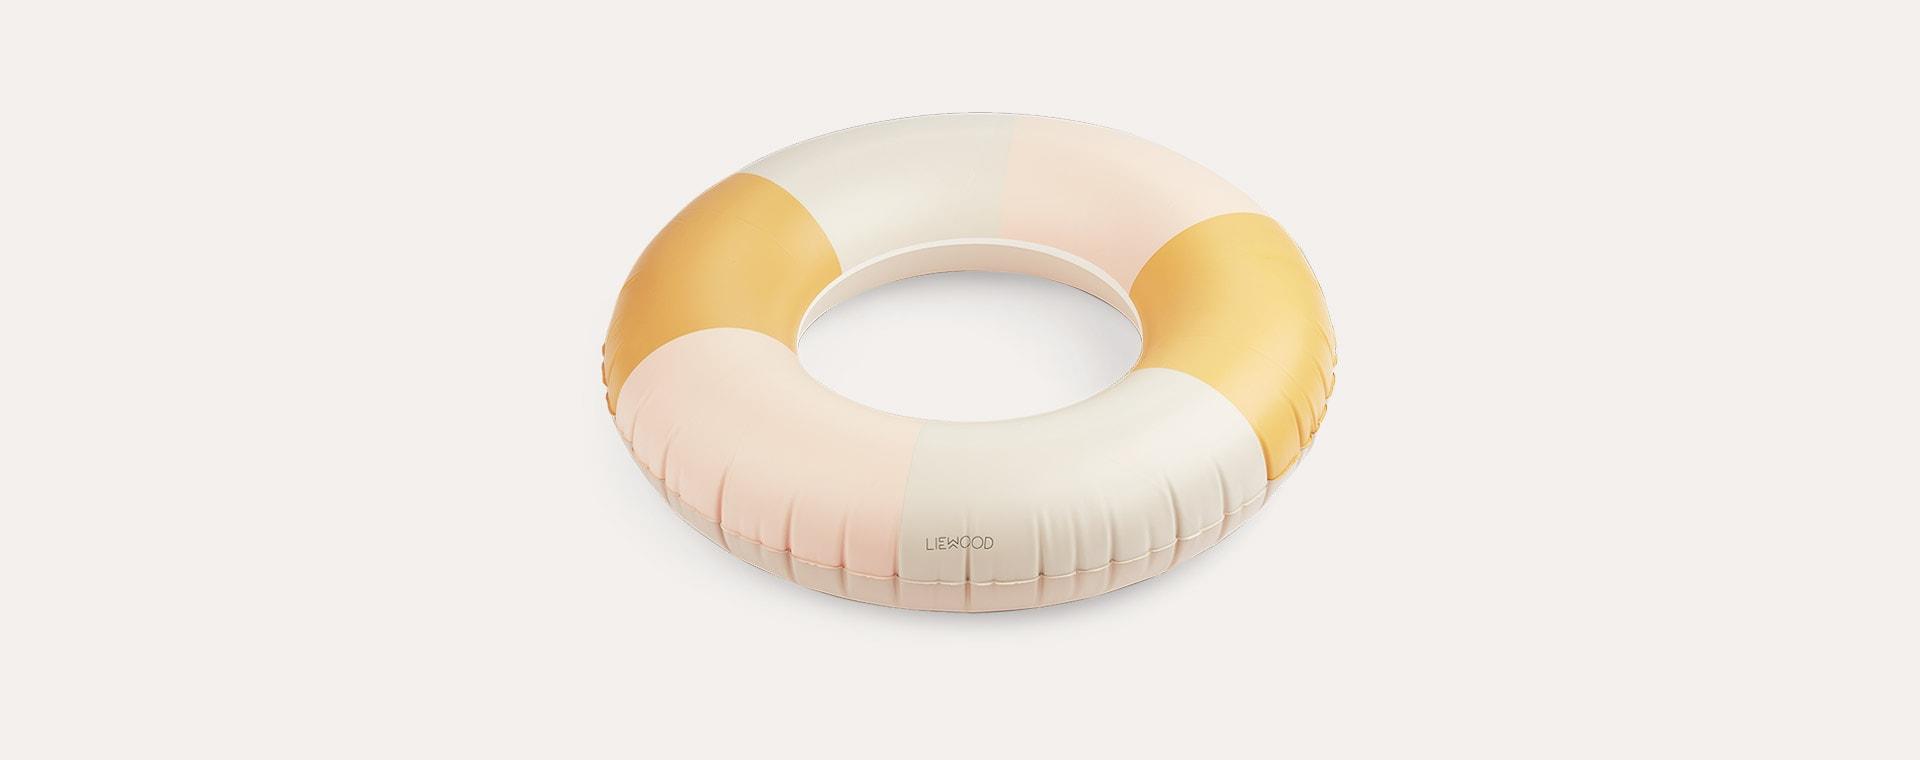 Stripe Peach/ Sandy/ Yellow Mellow Liewood Donna Swim Ring